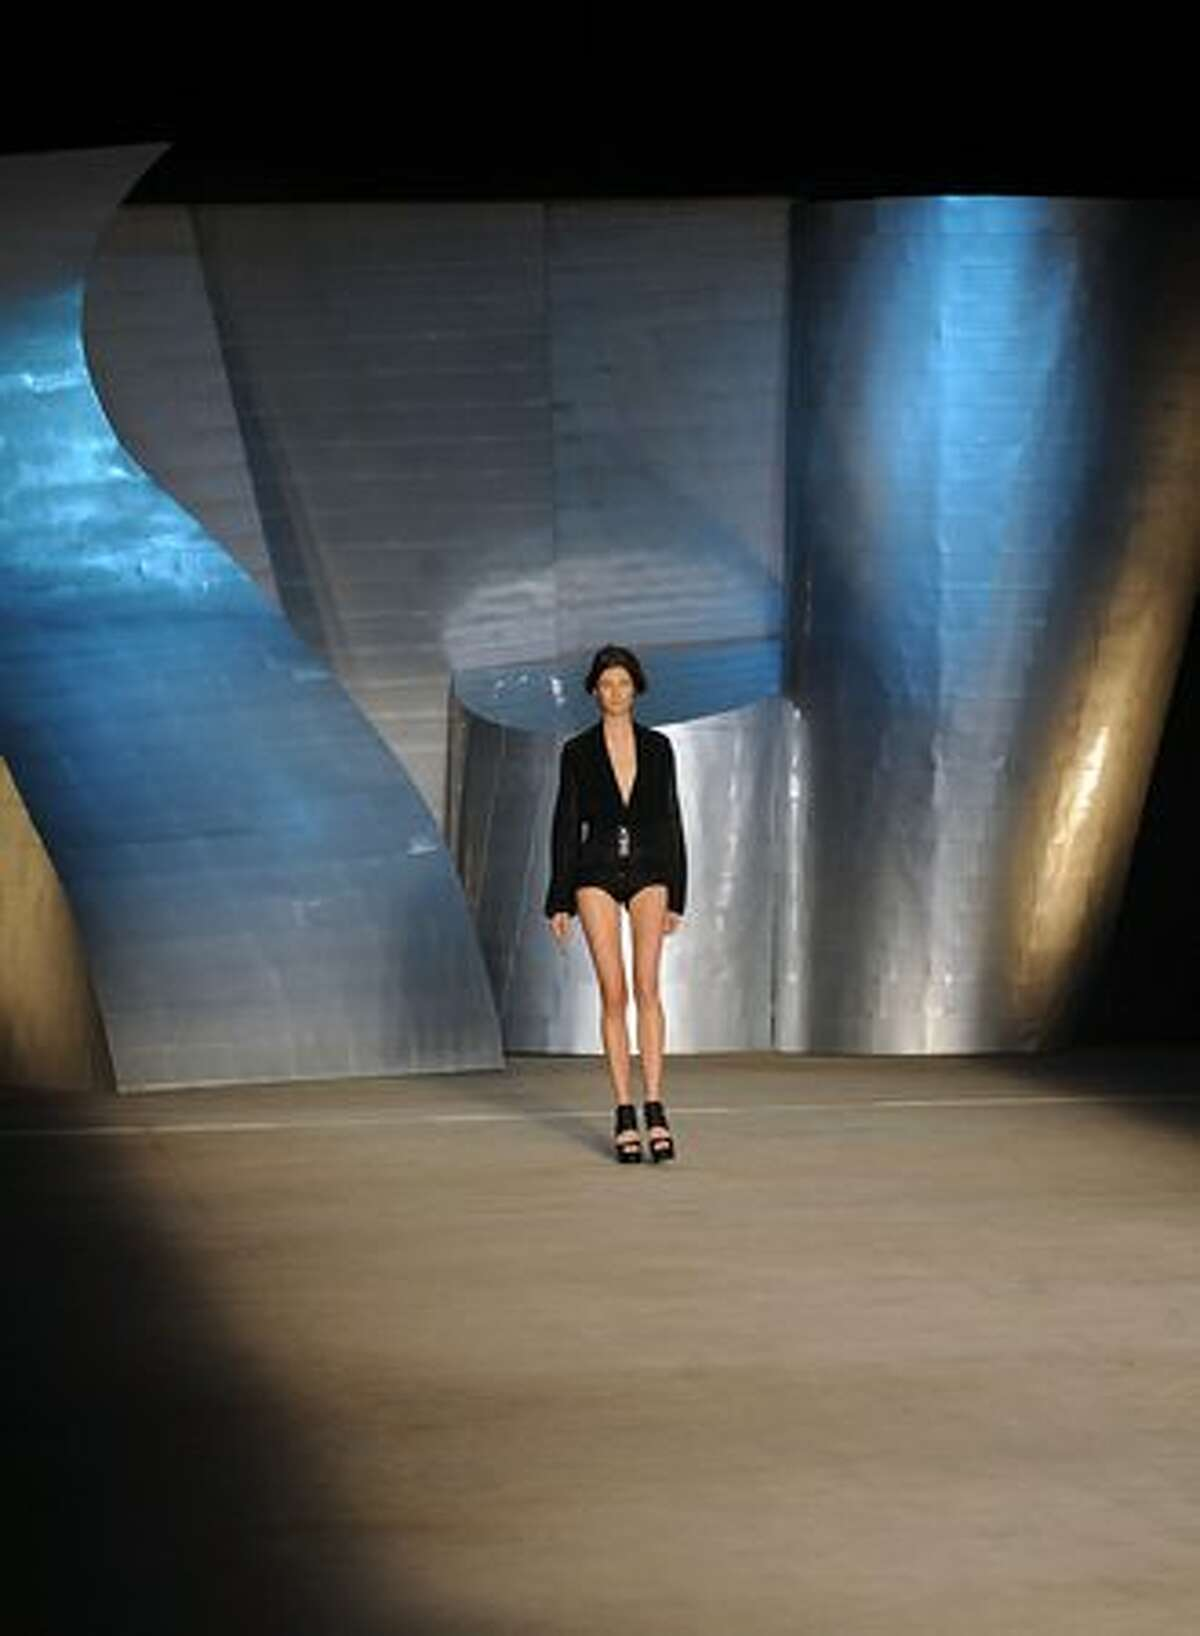 A model presents a creation by designer Patachou during the Rio Fashion Week, Summer 2010/2011 collection, in Rio de Janeiro.